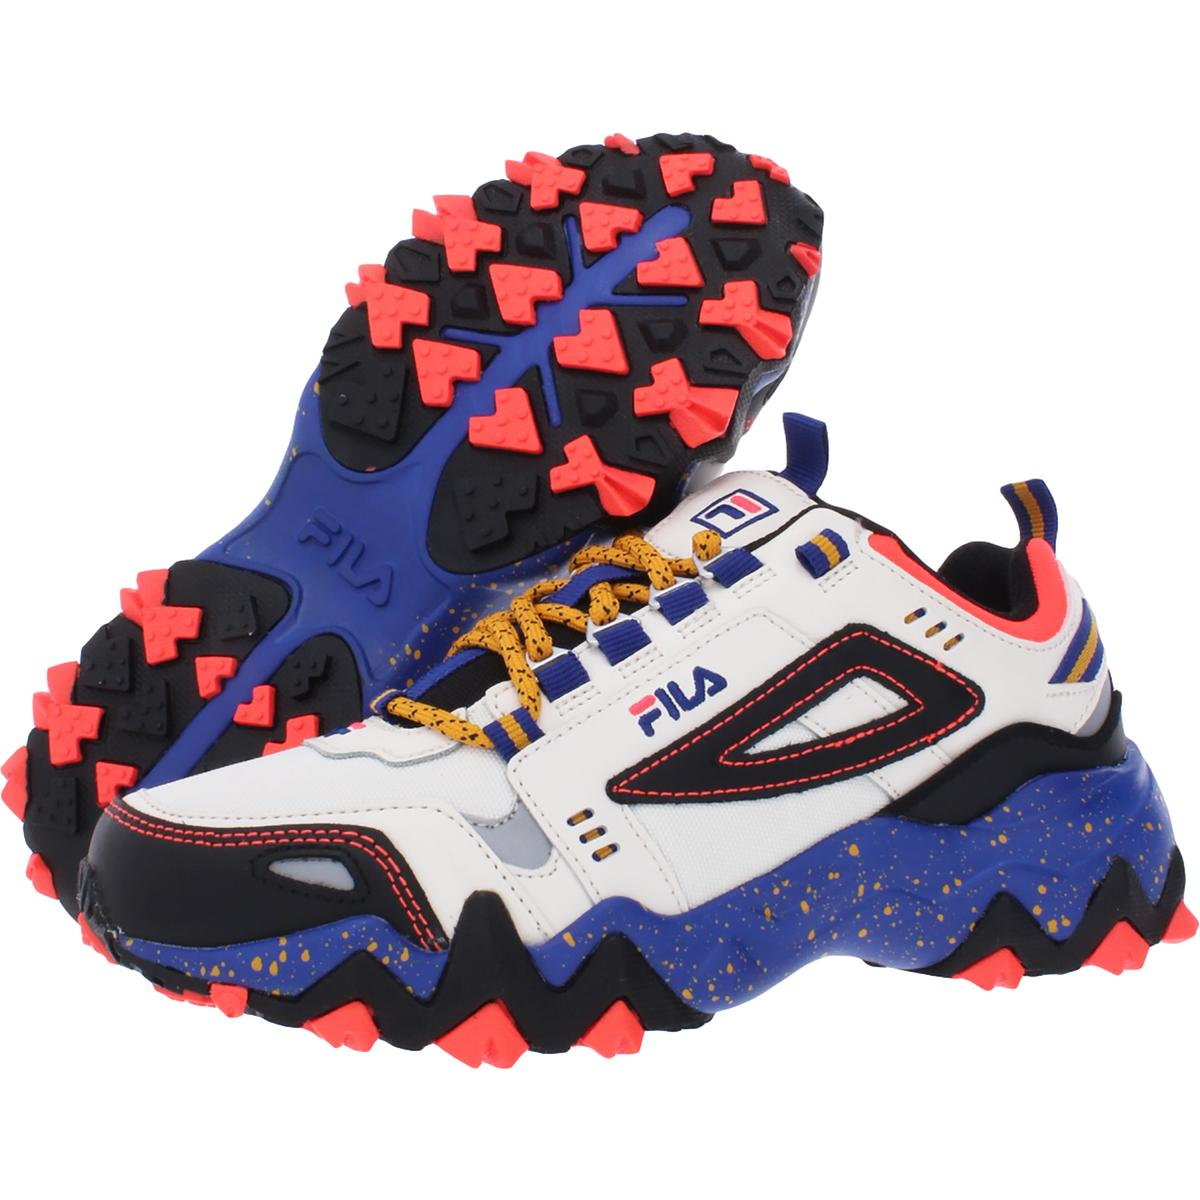 thumbnail 3 - Fila Women's Oakmont Leather Retro-Inspired Chunky Athletic Hiking Trail Sneaker